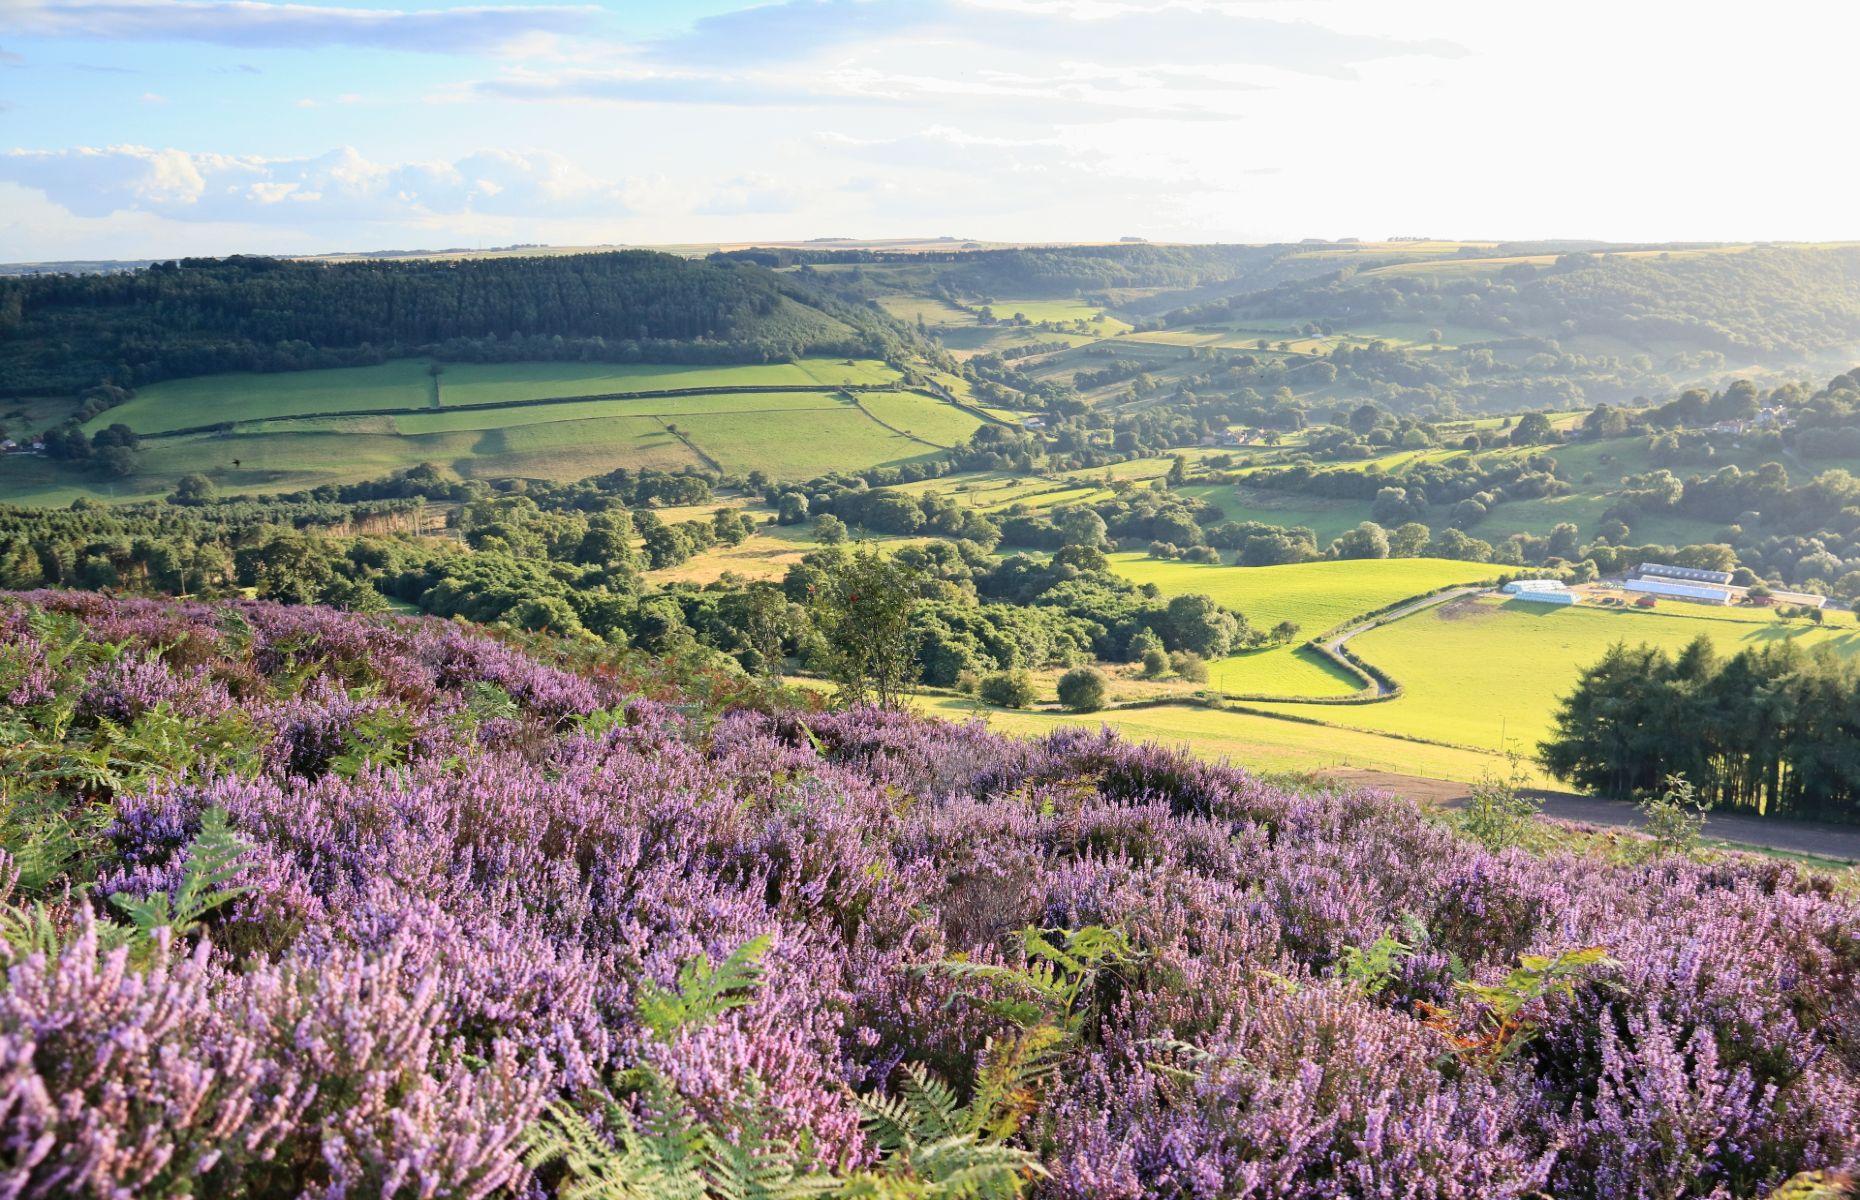 North York Moors countryside (Image: Bewickswan/Shutterstock)